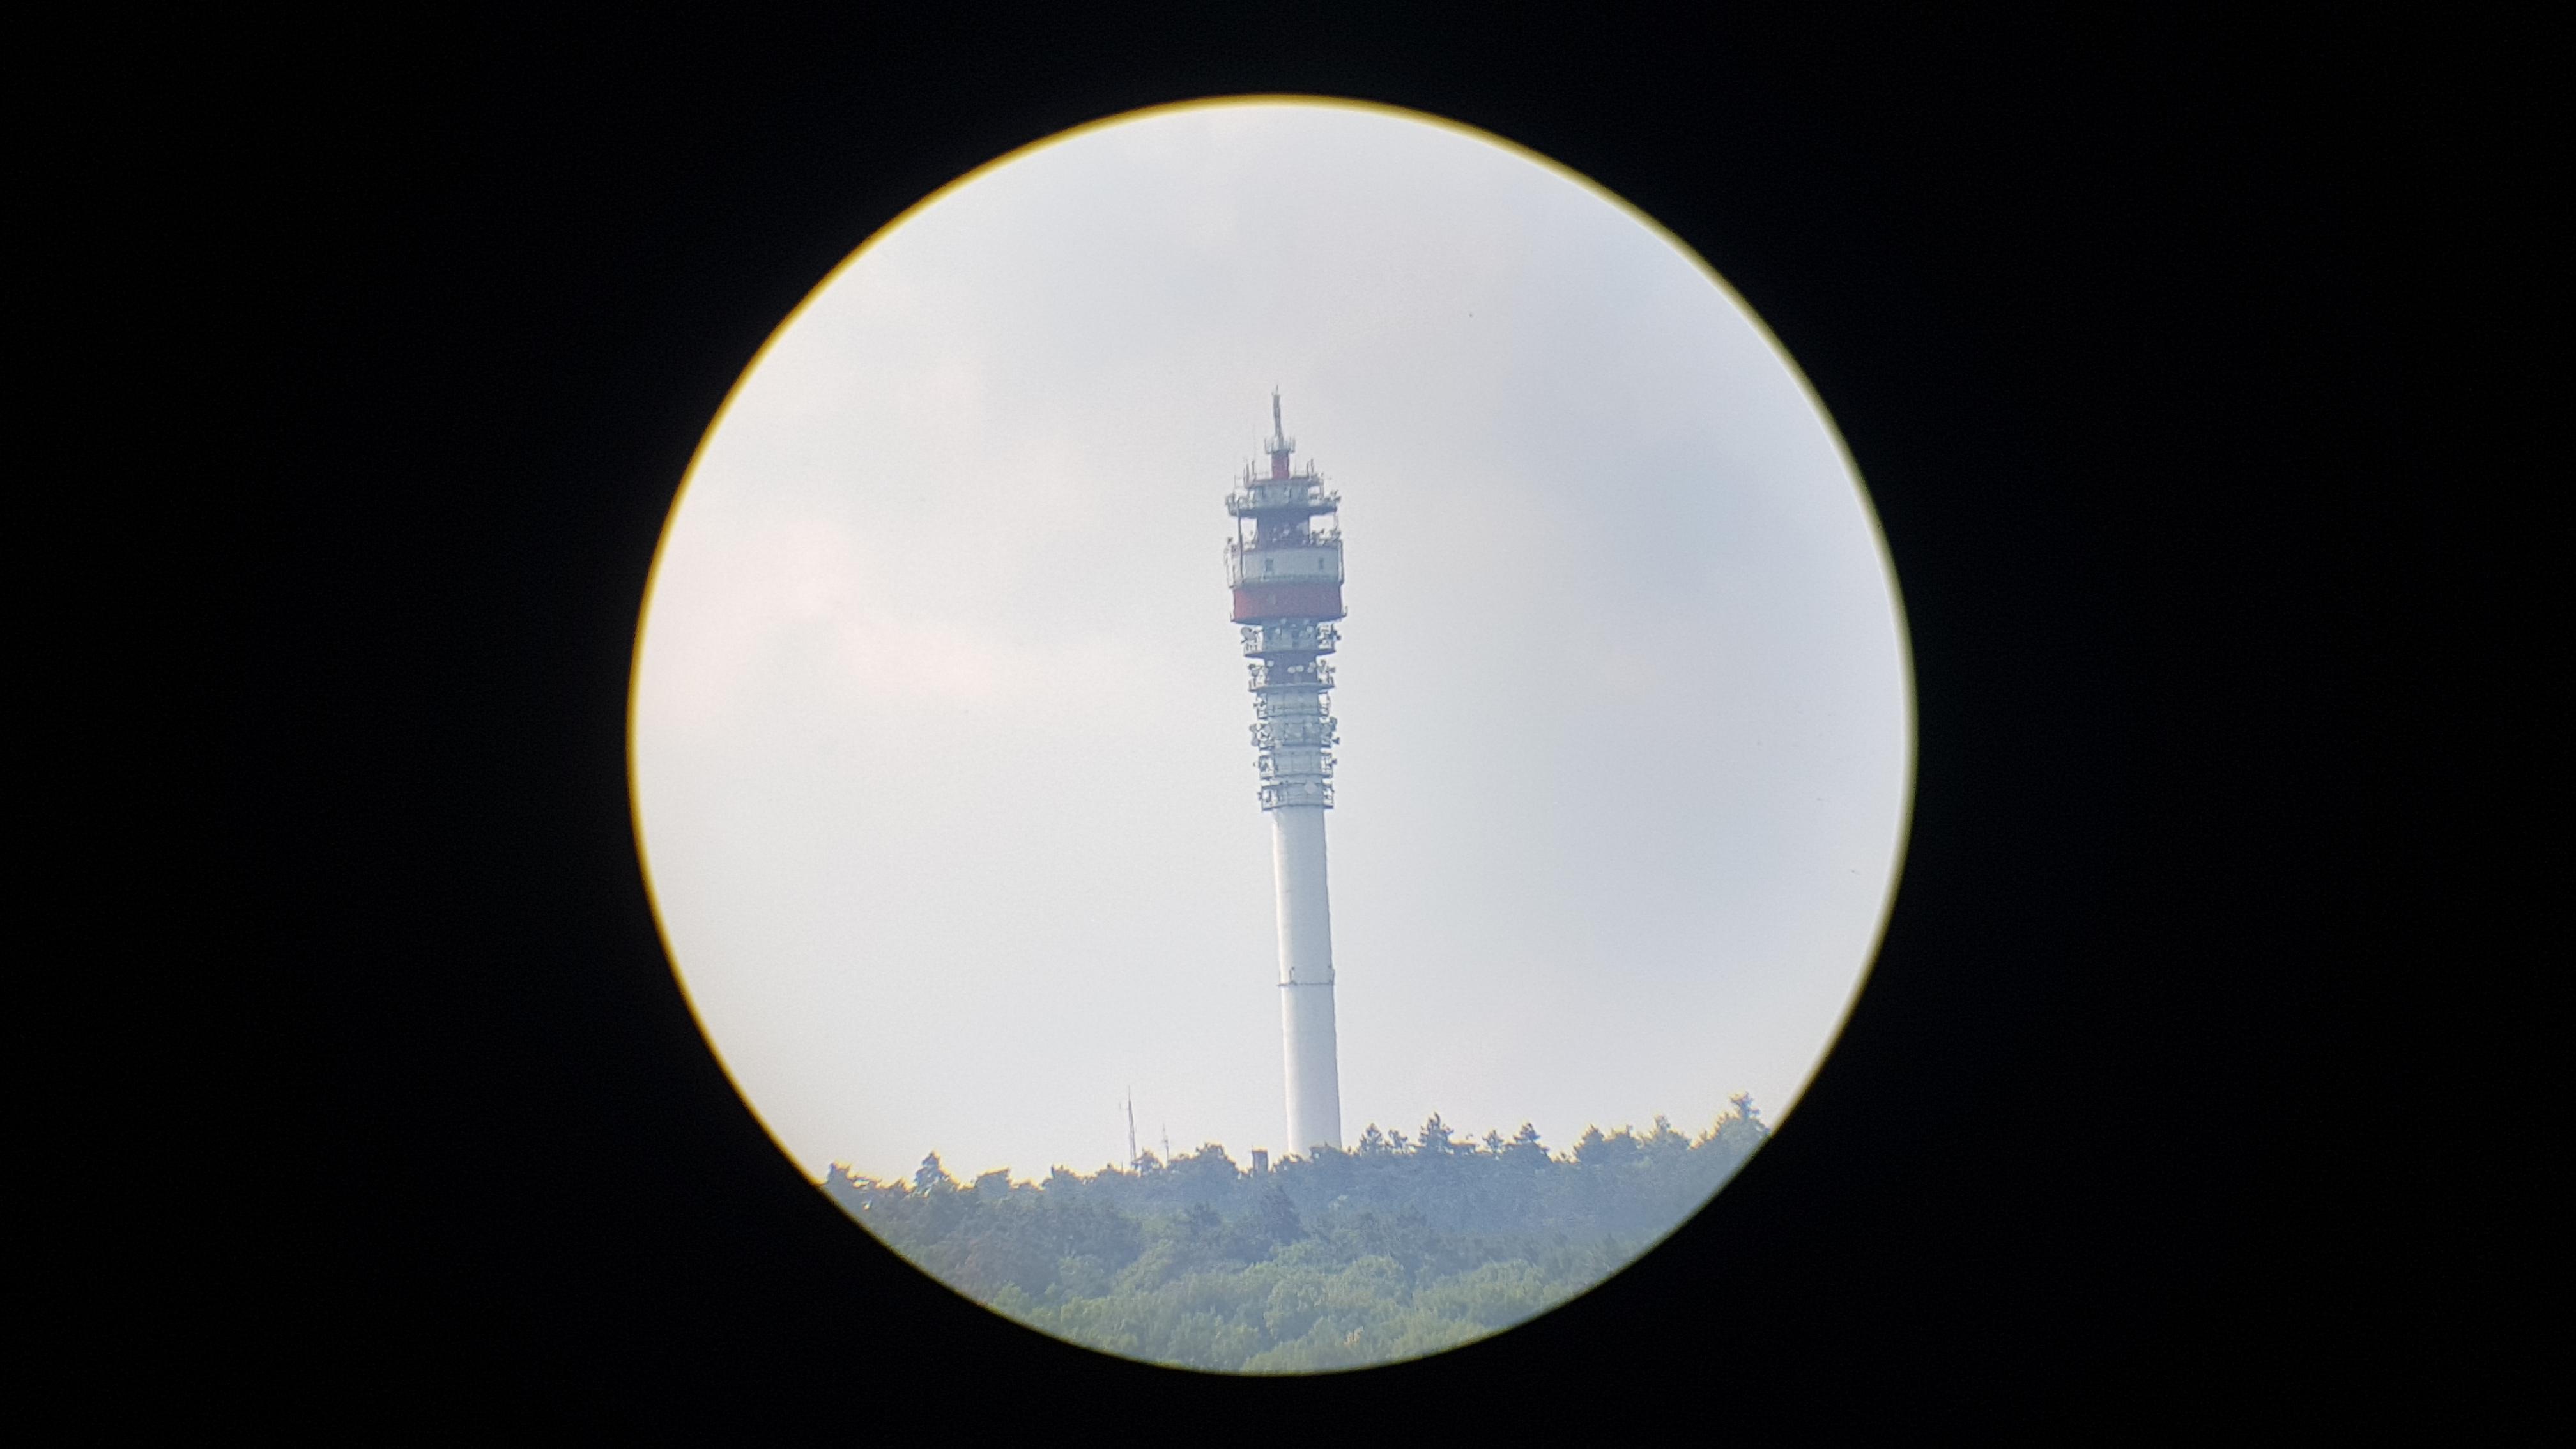 torony-20x-eyebre-20-60x60-tavcso-spektiv-latcso-monocular-megfigyelo-vadasz-loter-madar-figyelo-termeszet-kirandulas-spective-allvany-01.JPG